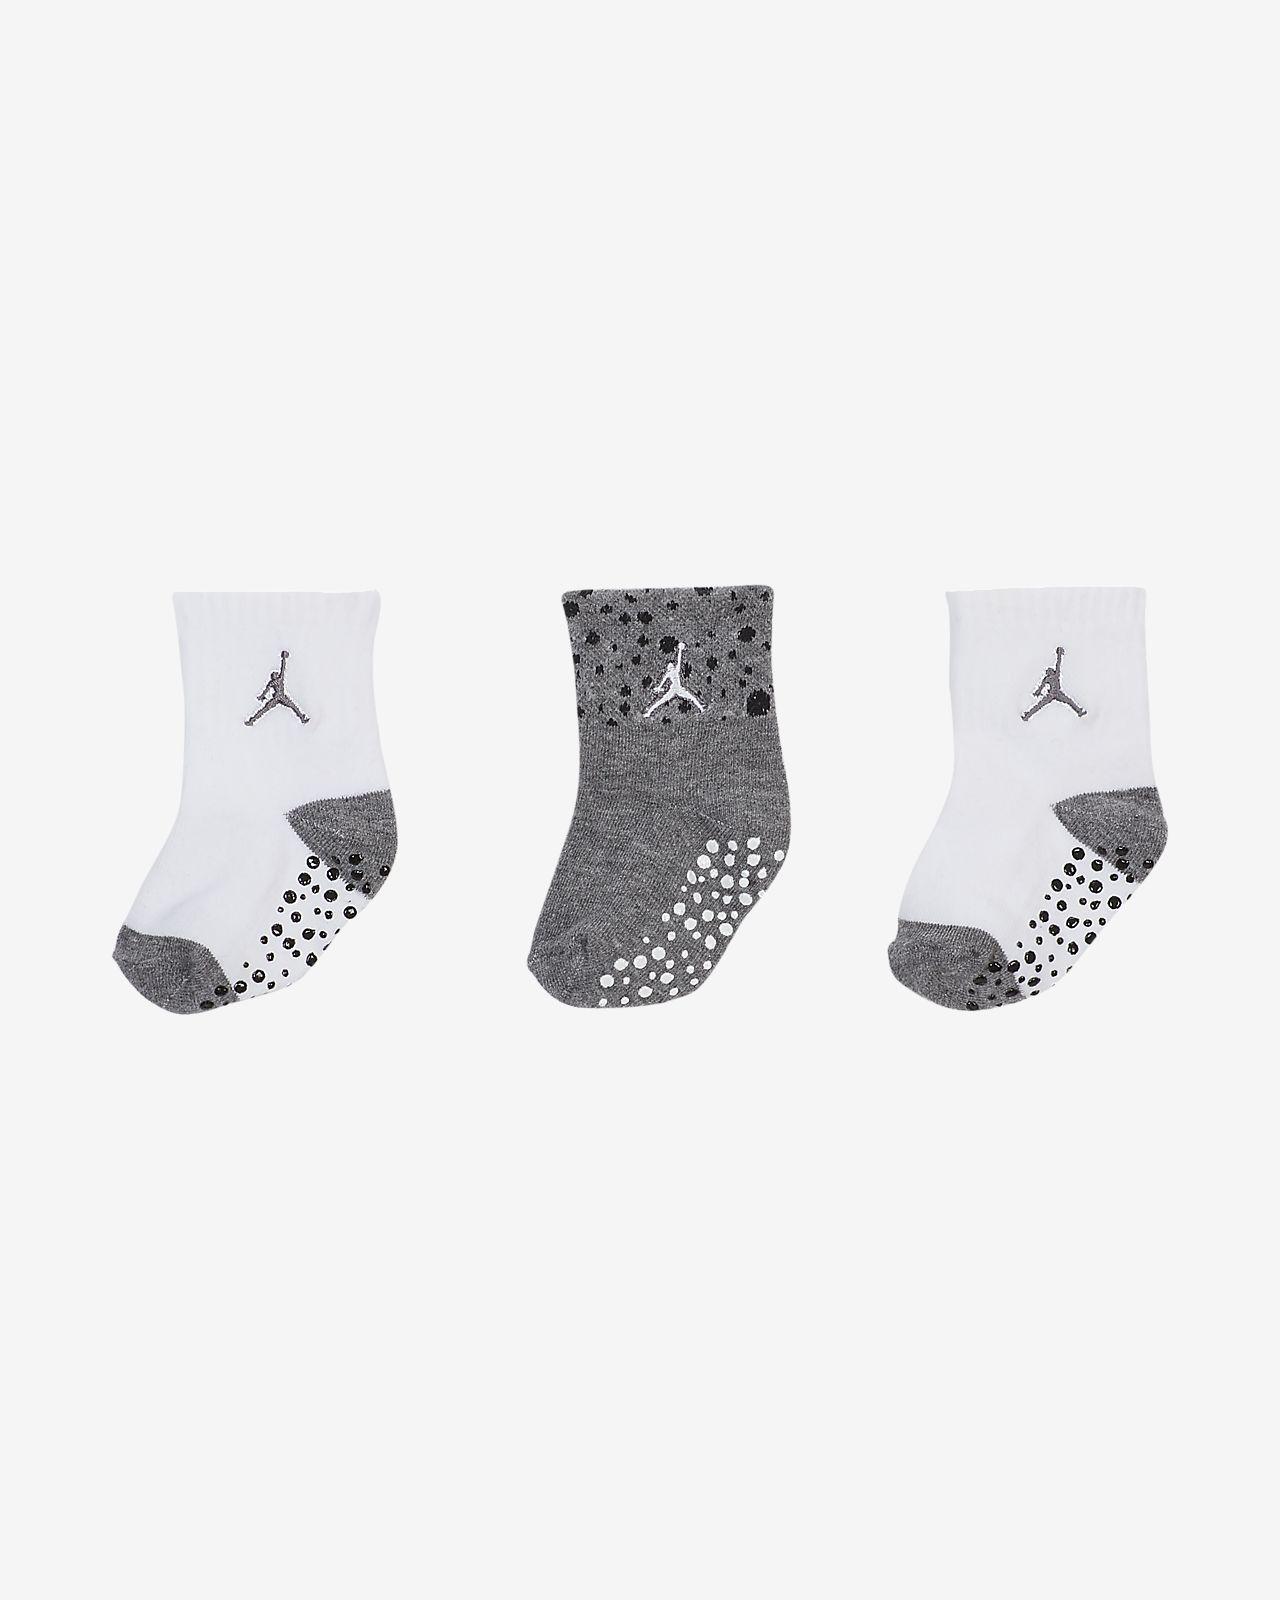 Skarpety dla niemowląt do kostki Jordan (3 pary)